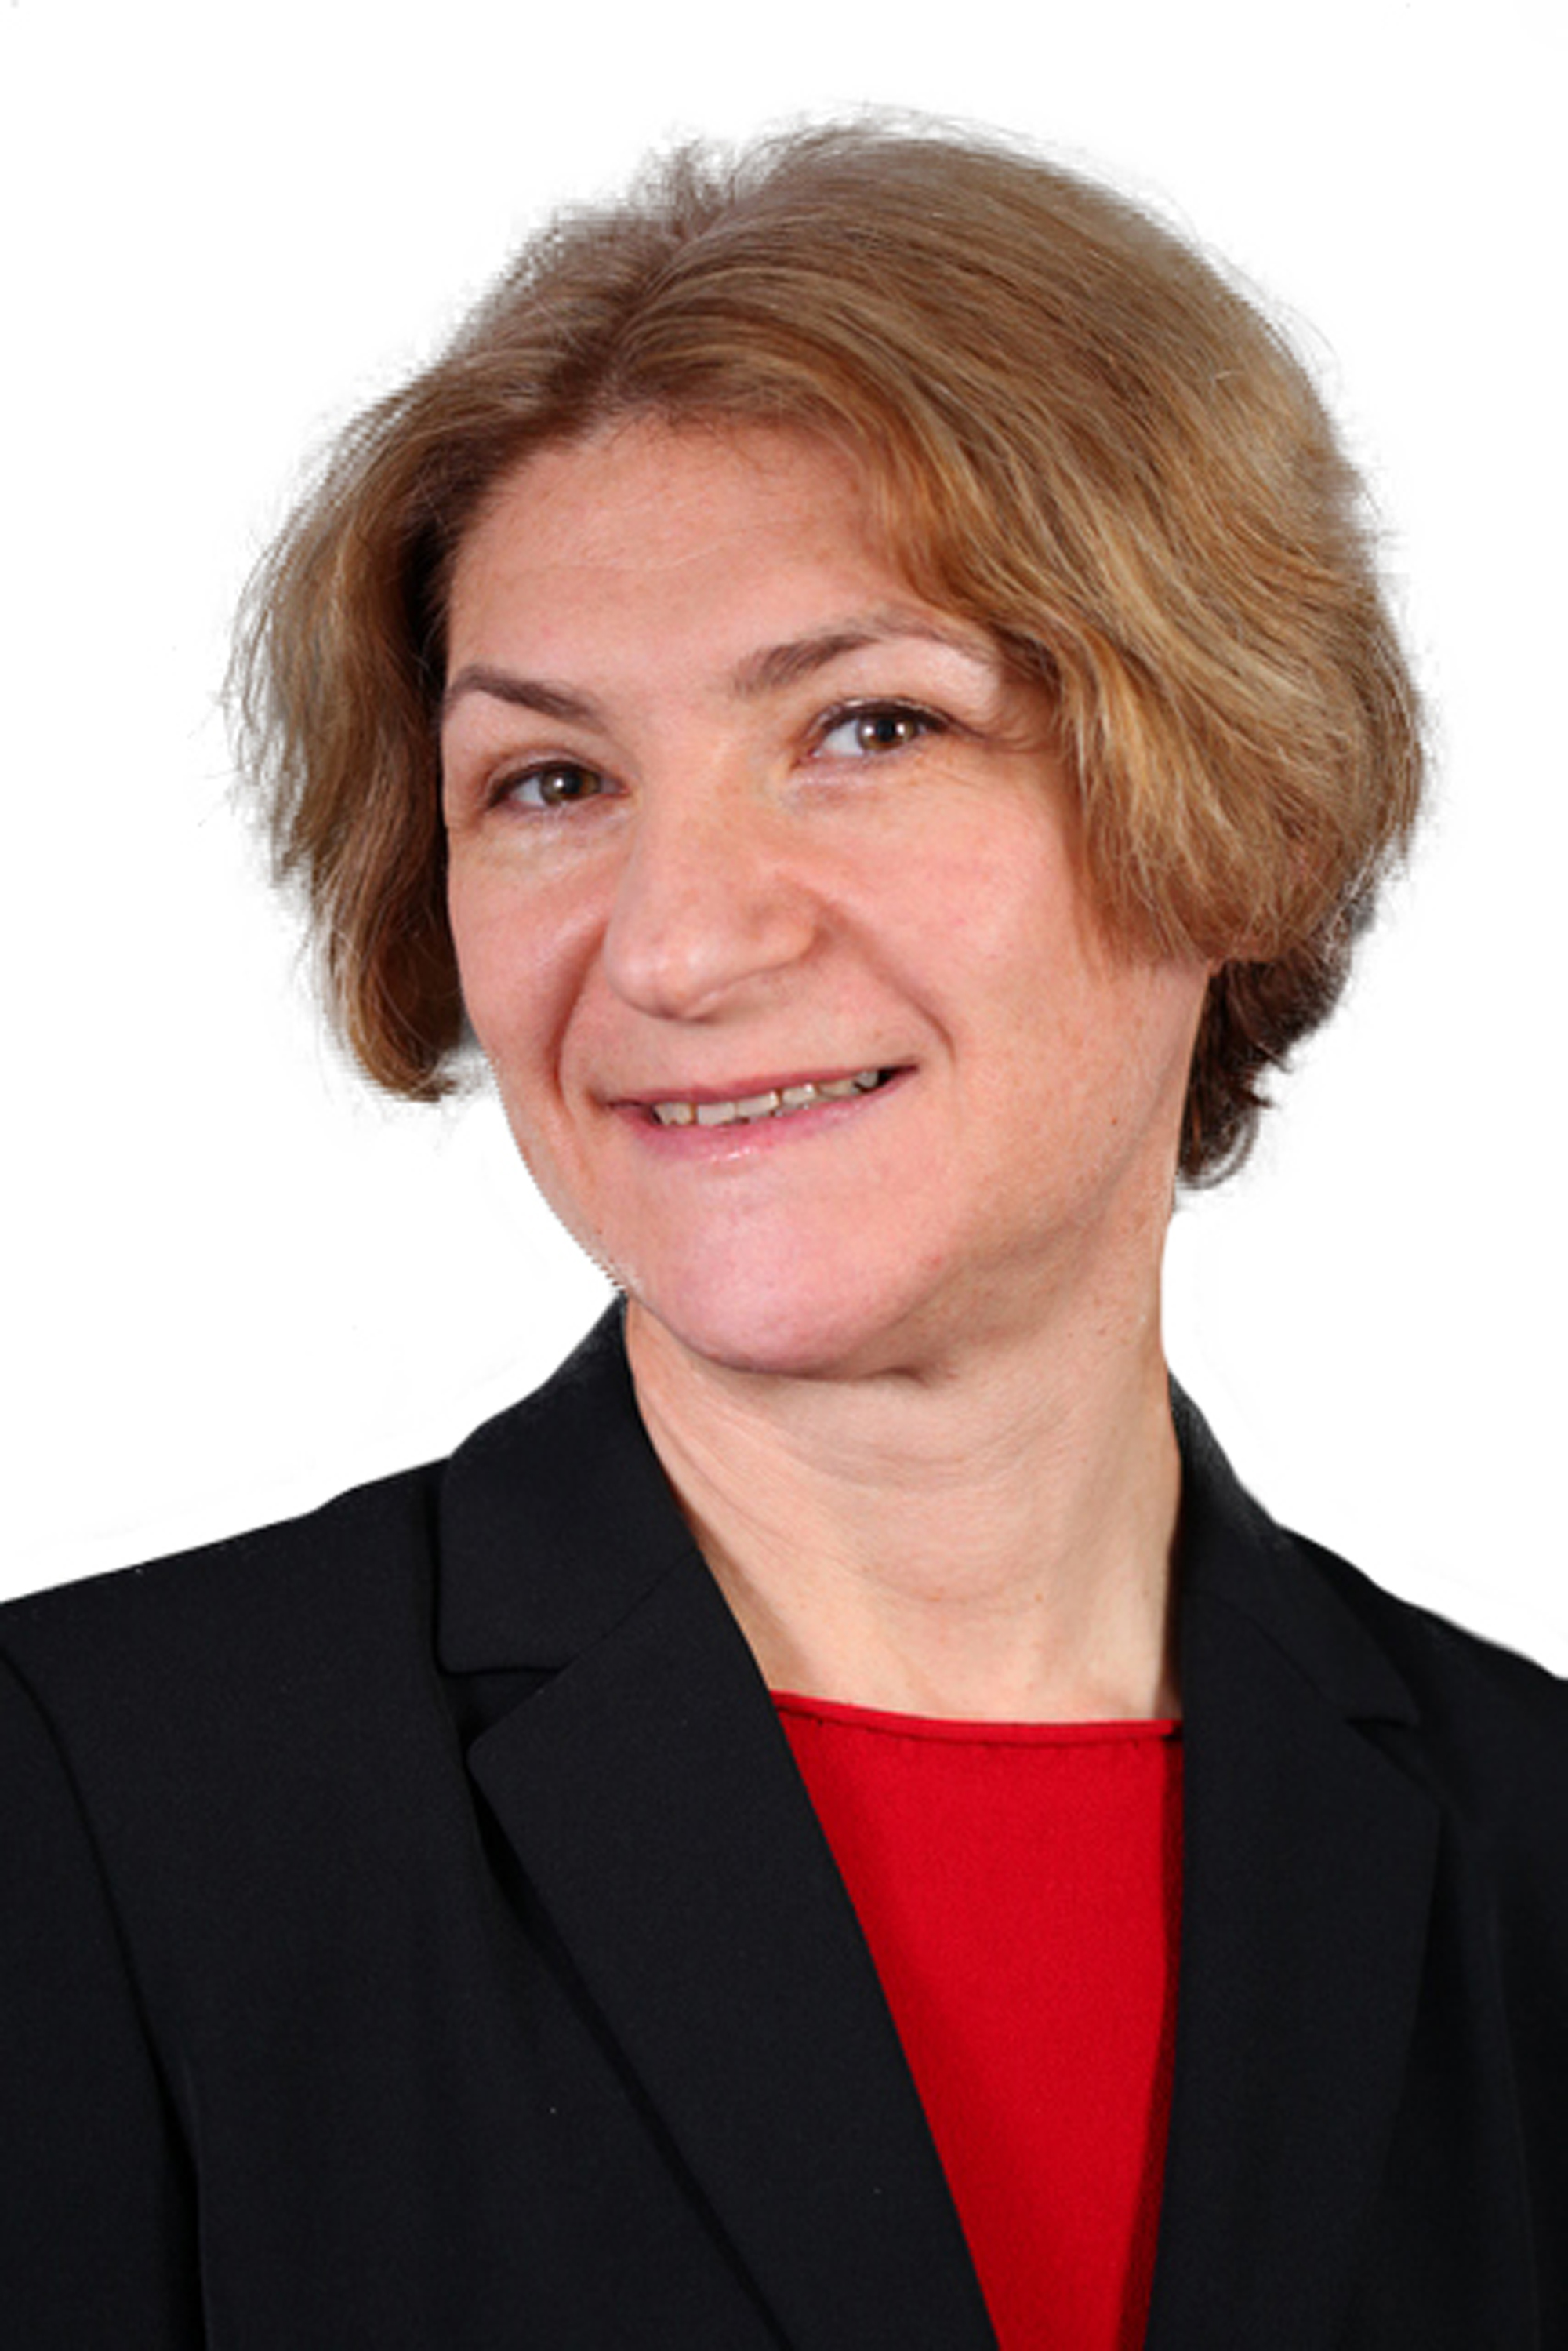 Svetlana Sicular, Research VP, Gartner - HR